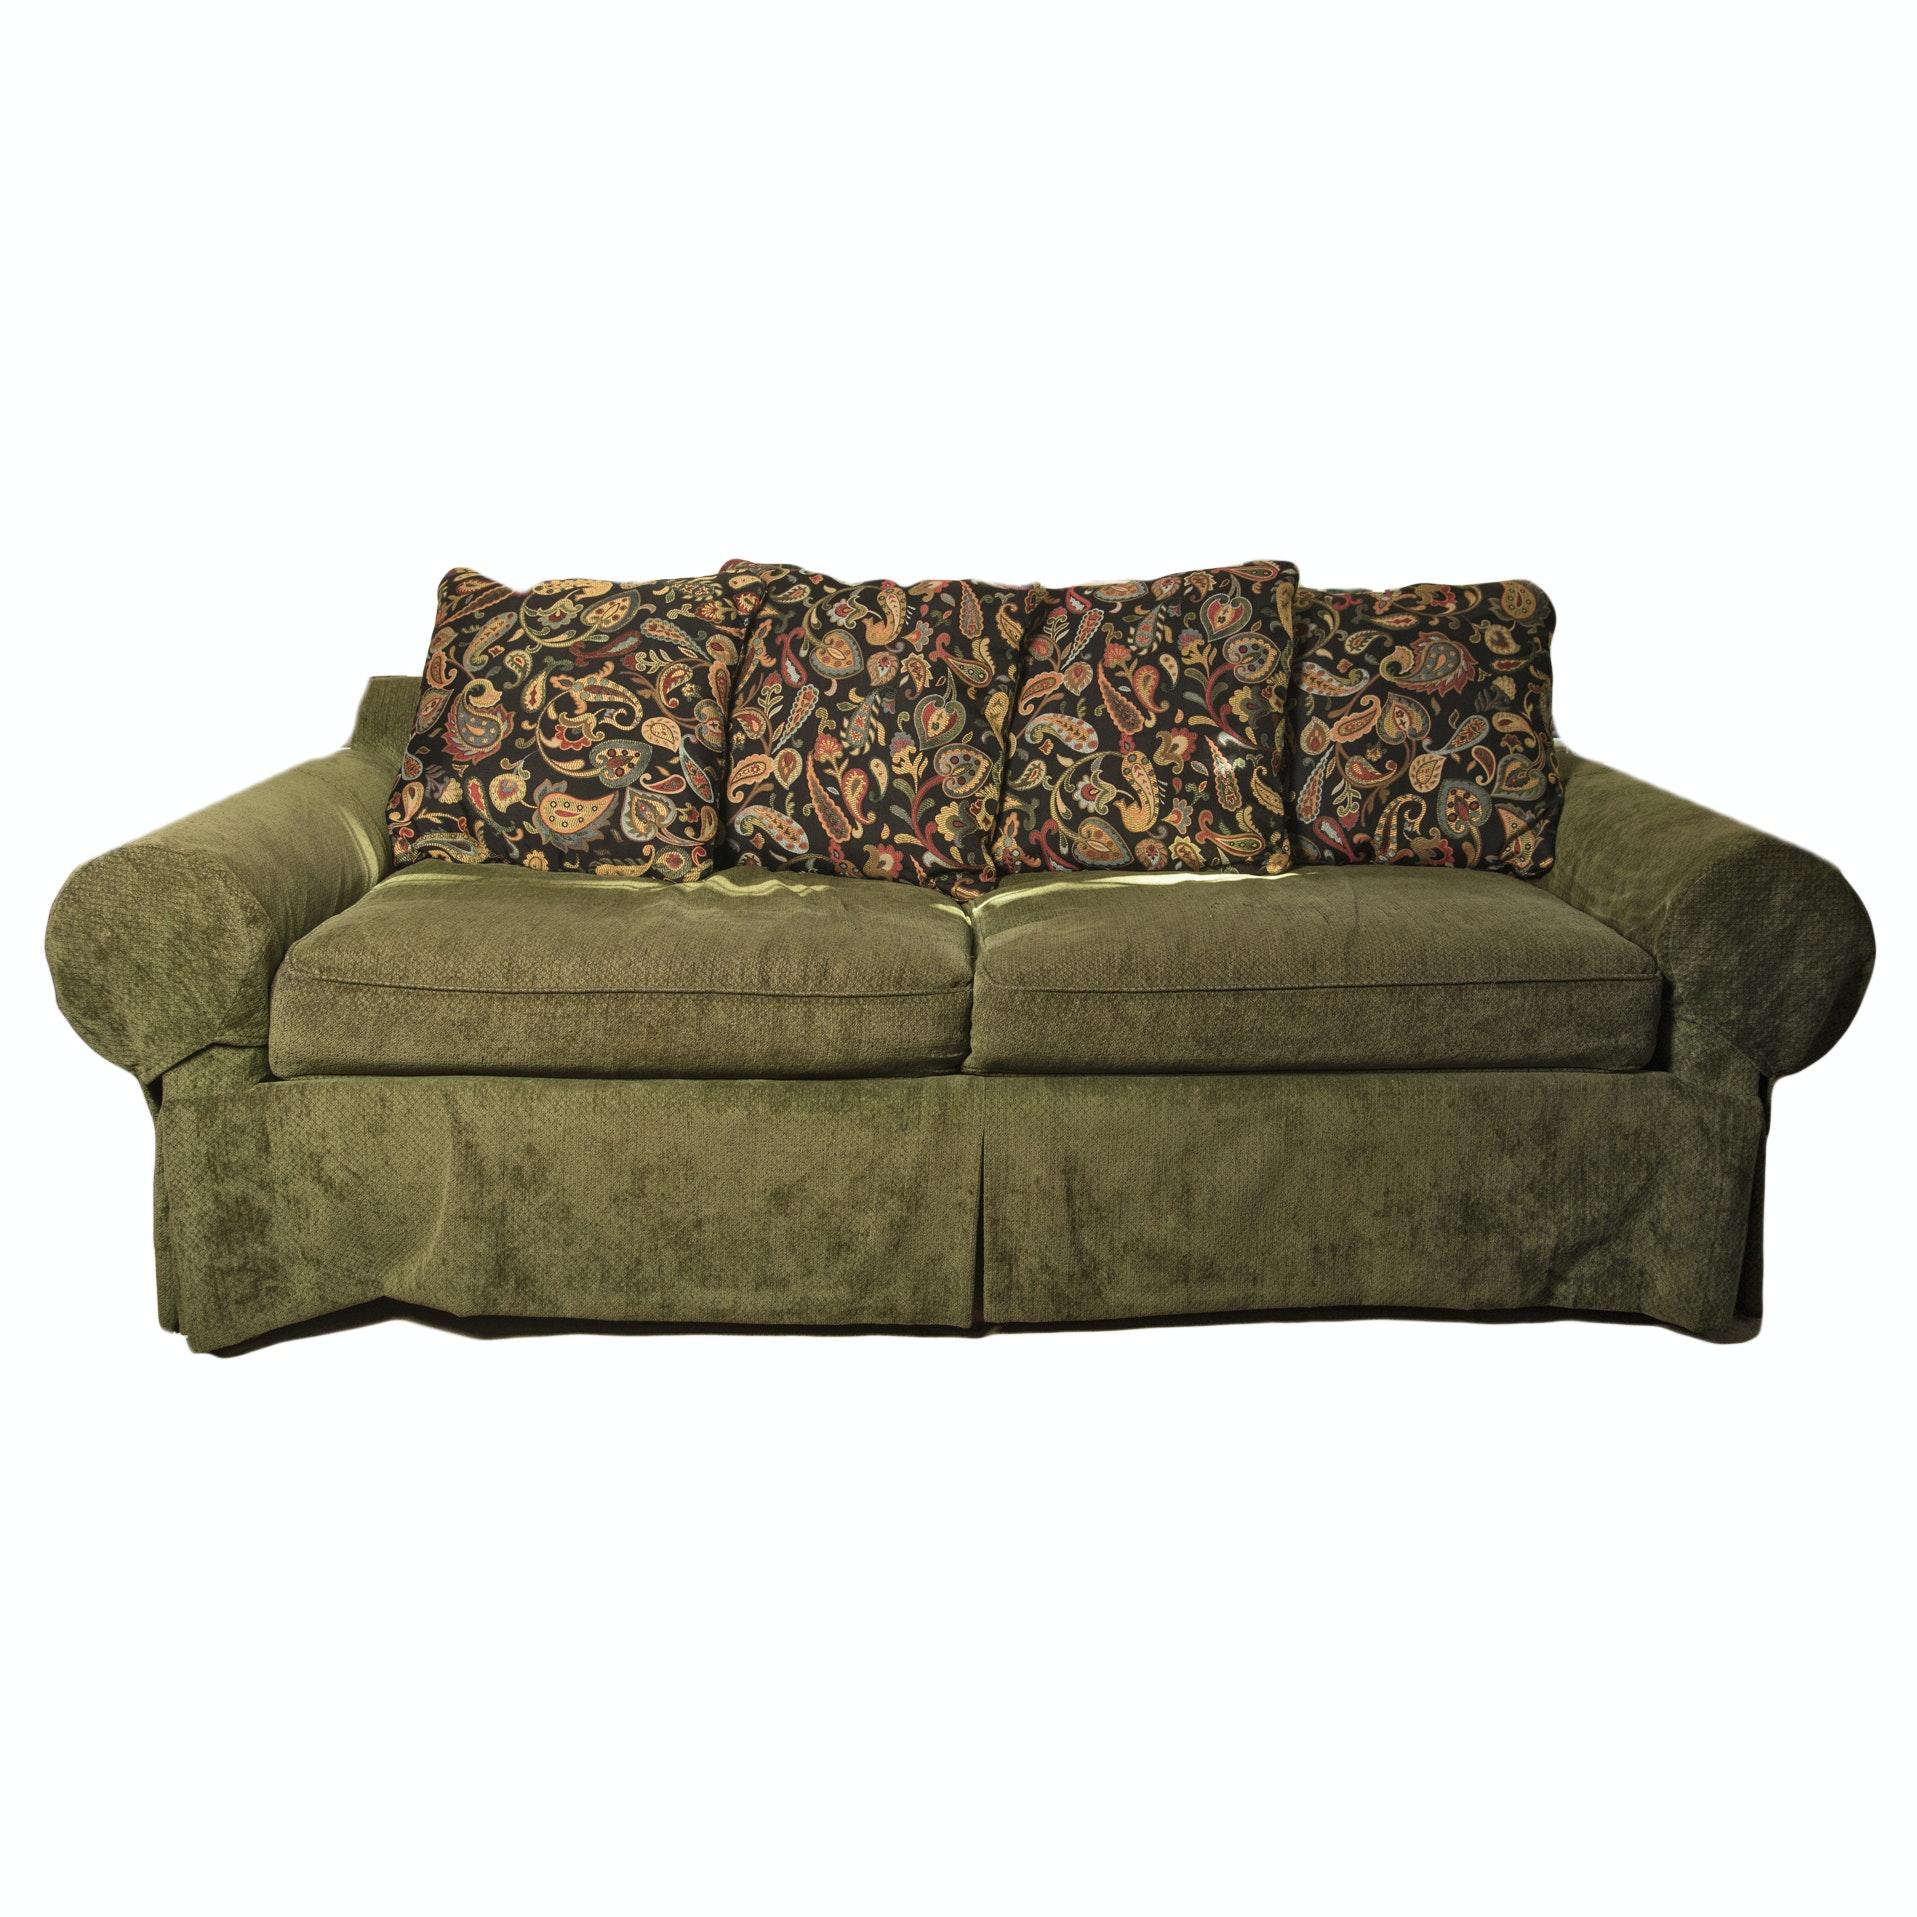 Fairington Southwood Oversized Sofa